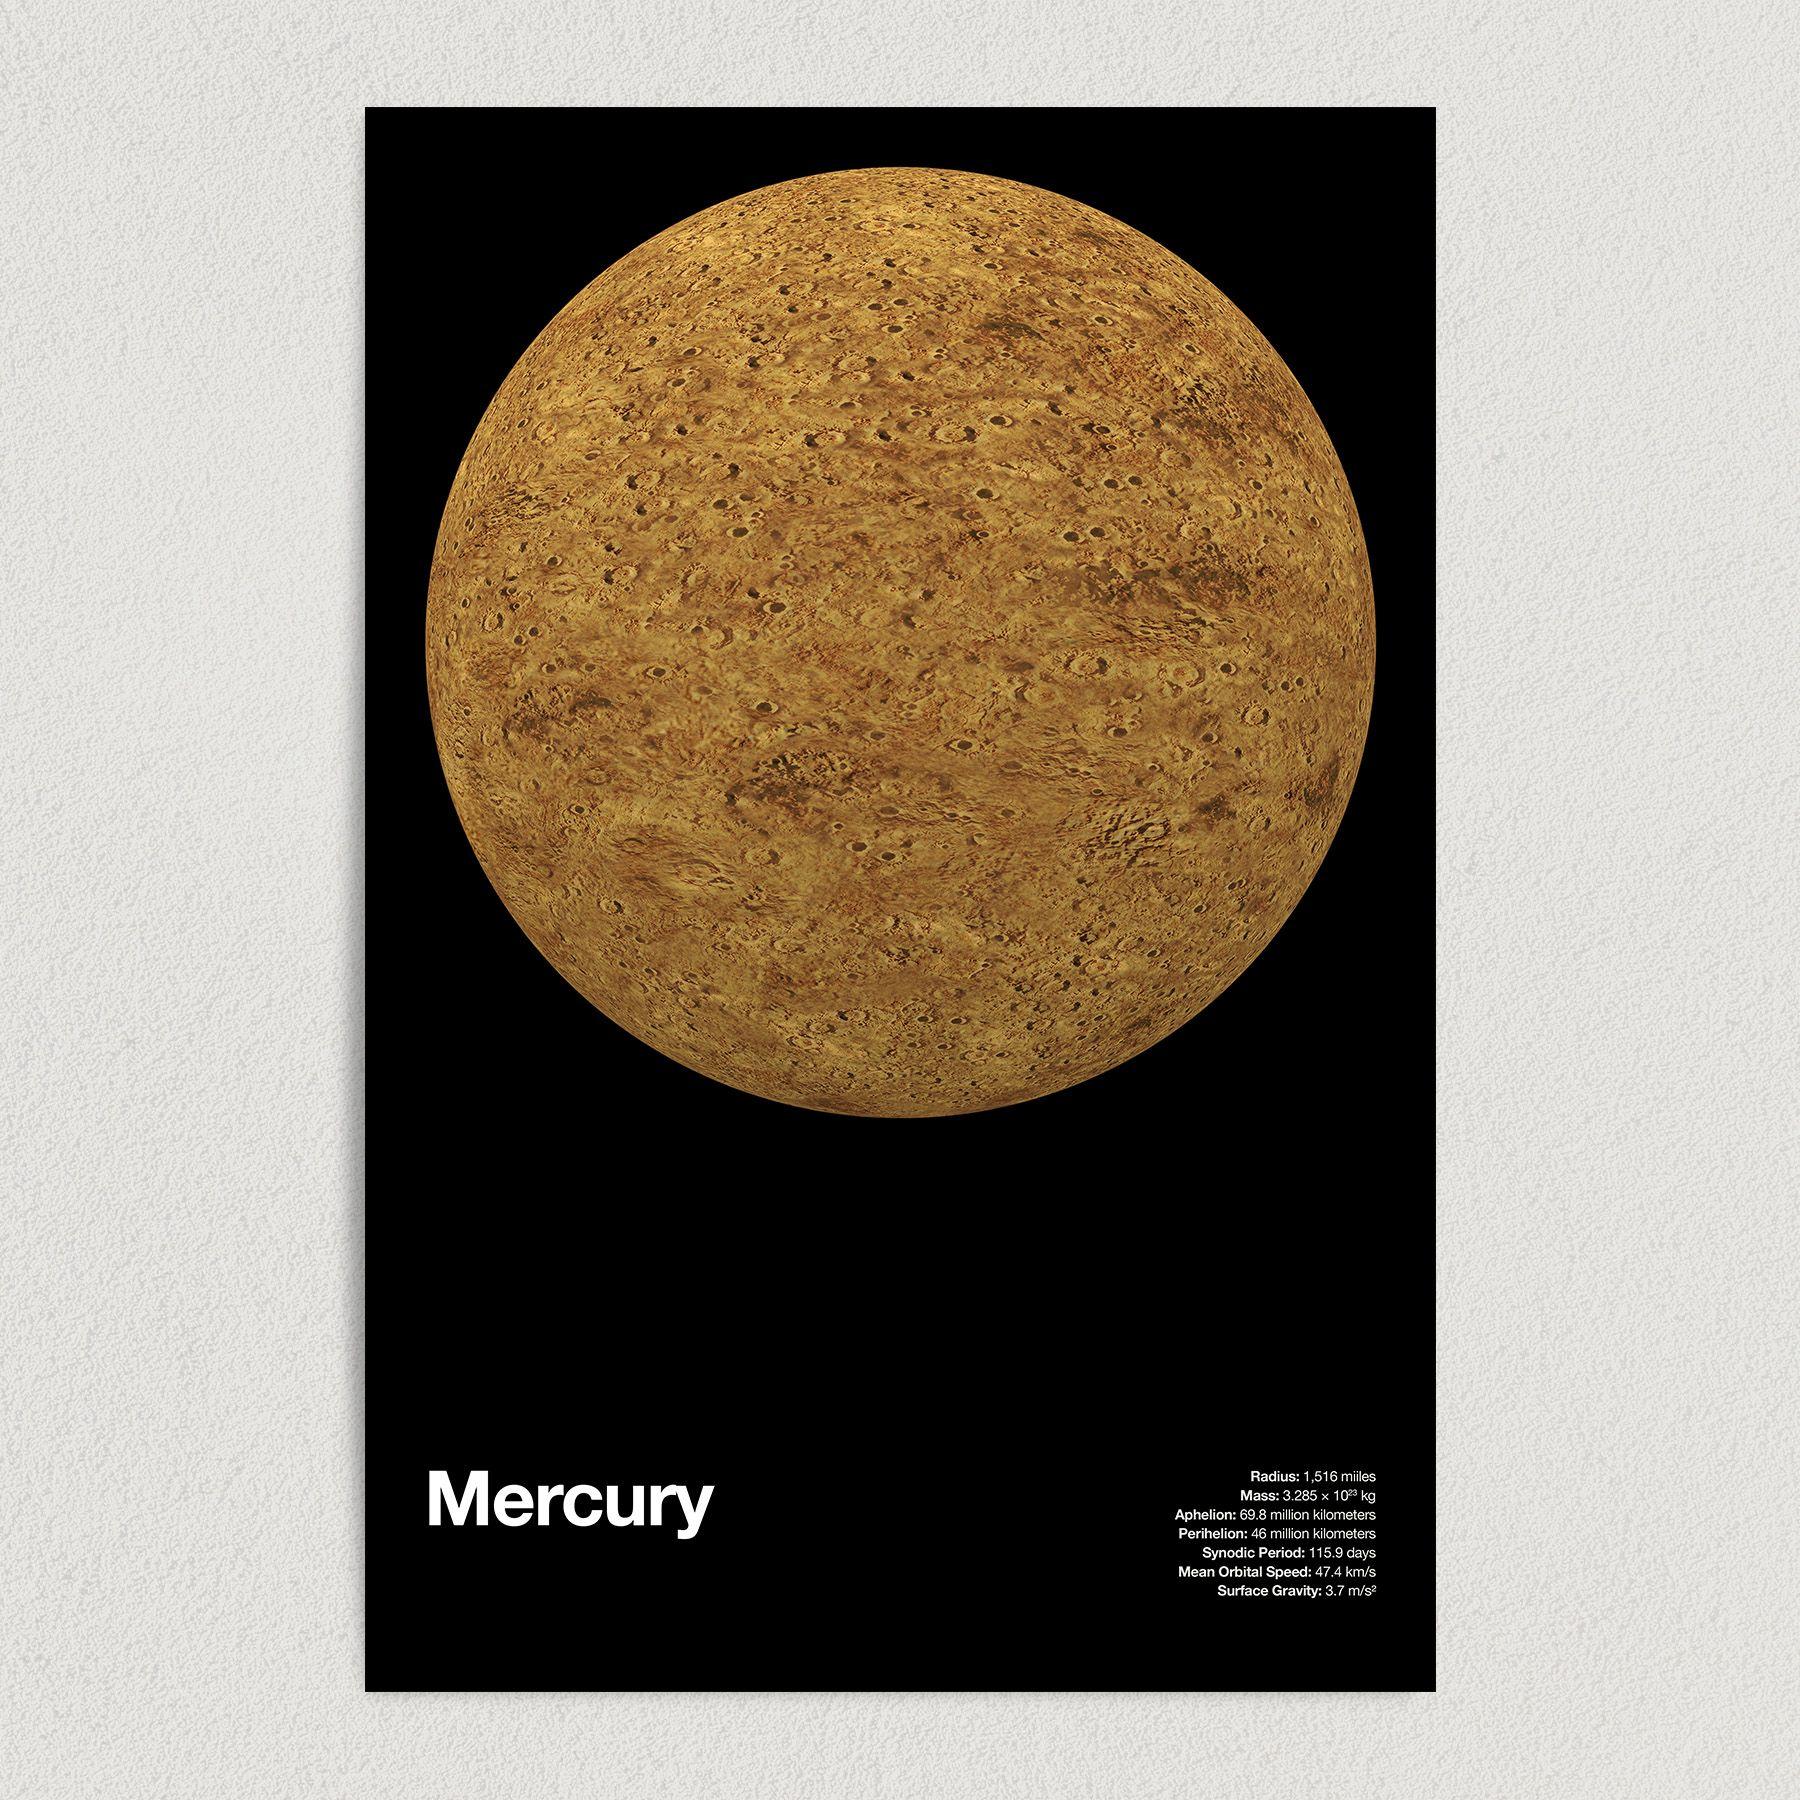 Planet Mercury Astronomy Education Art Print Poster 12″ x 18″ Wall Art SS2158